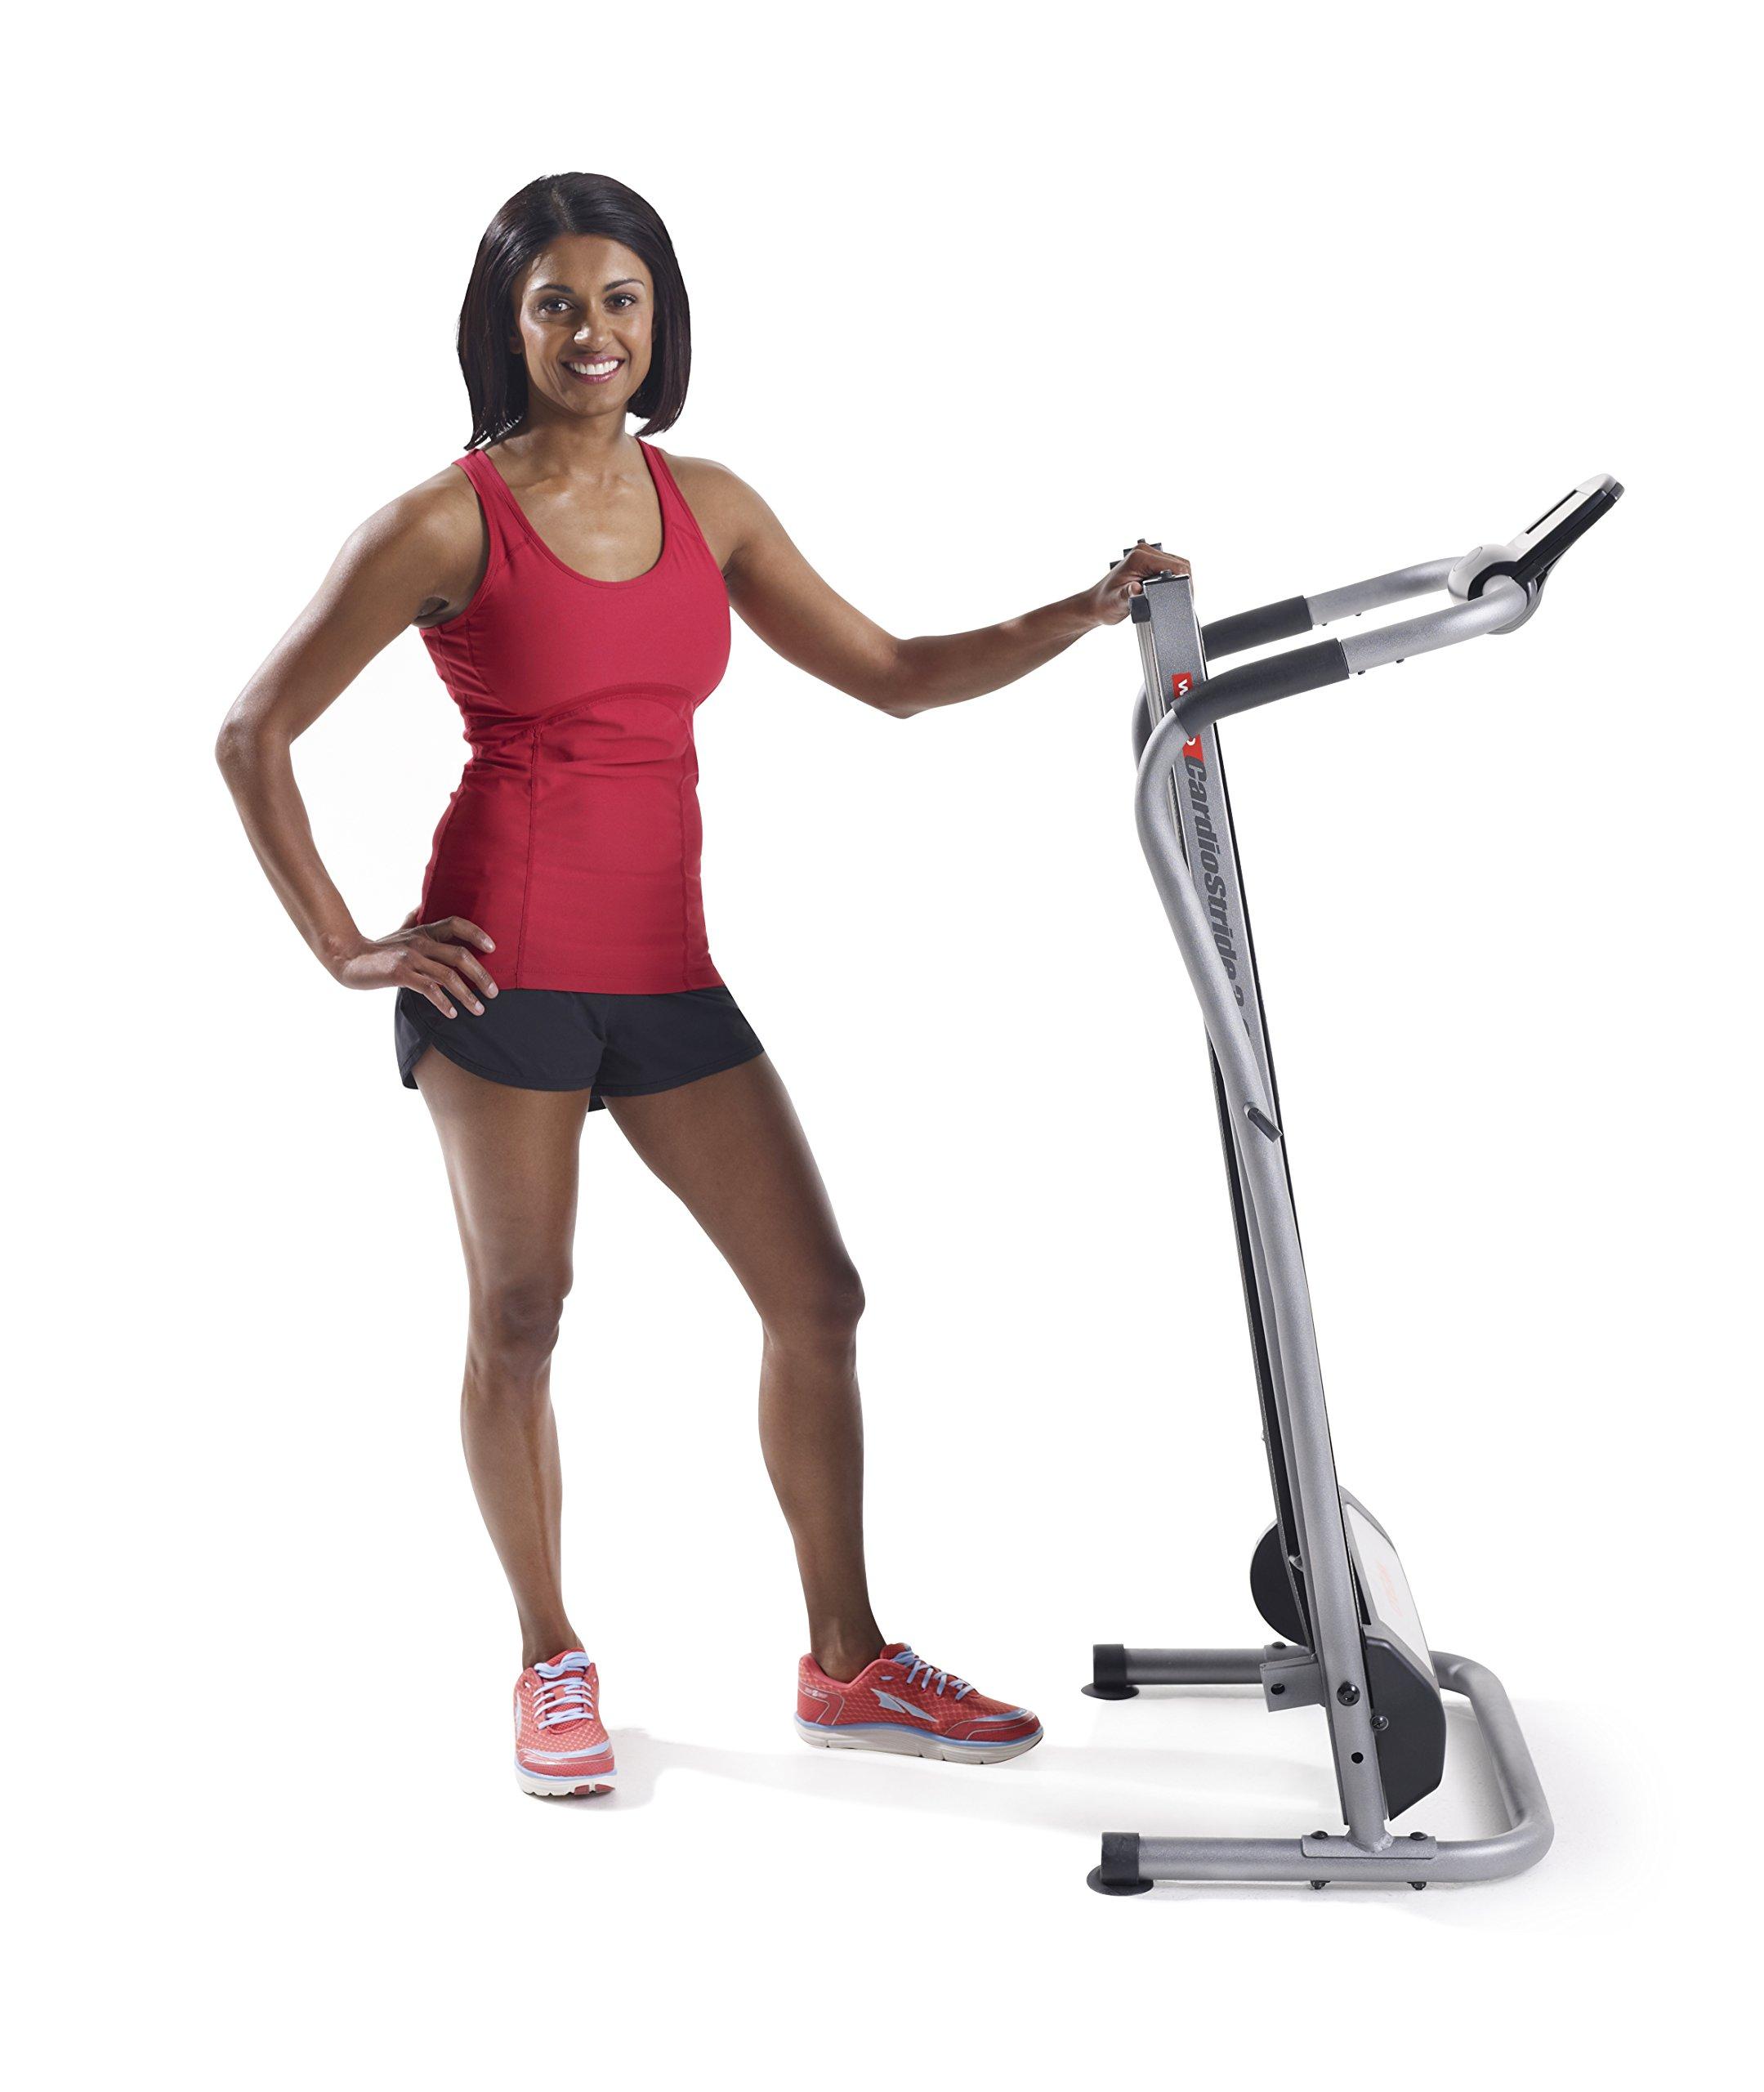 Weslo WLTL99315 CardioStride 3.0 Treadmill by Weslo (Image #13)